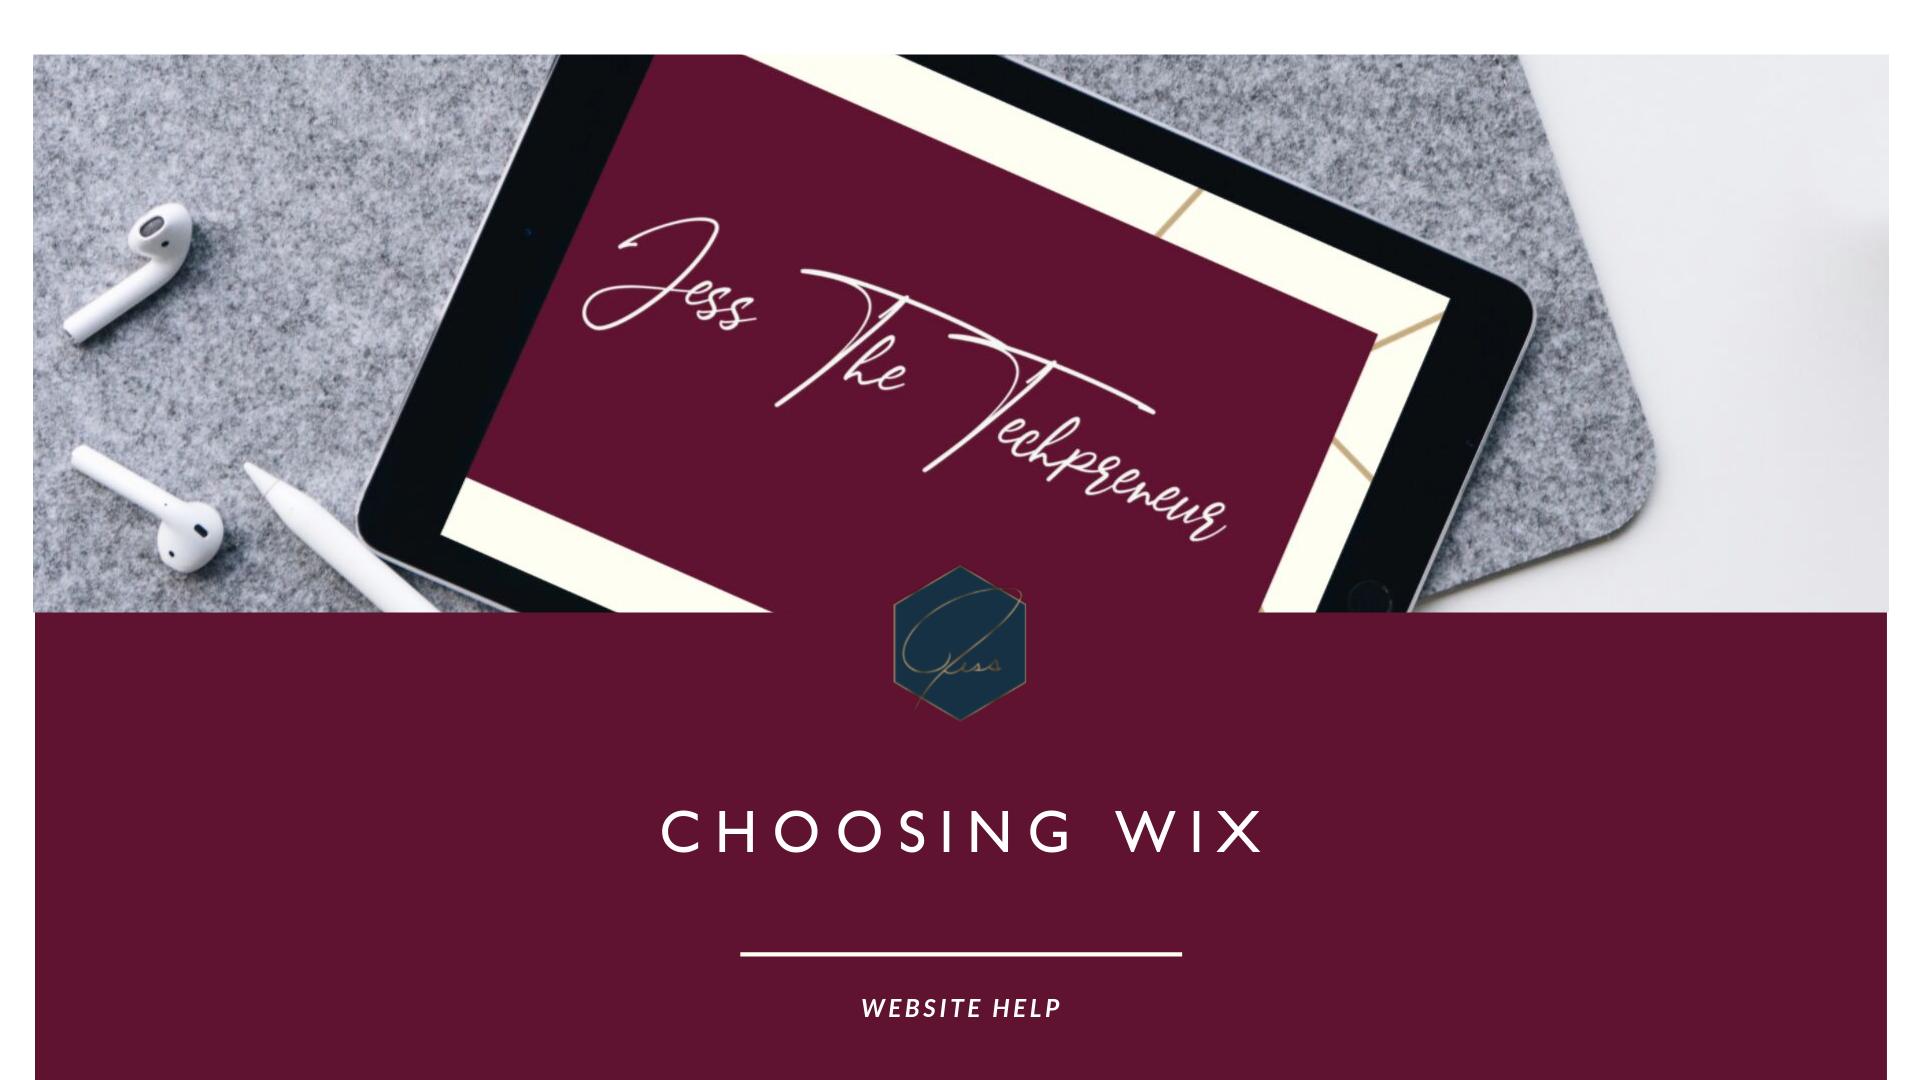 Choosing Wix | Jess The Techpreneur